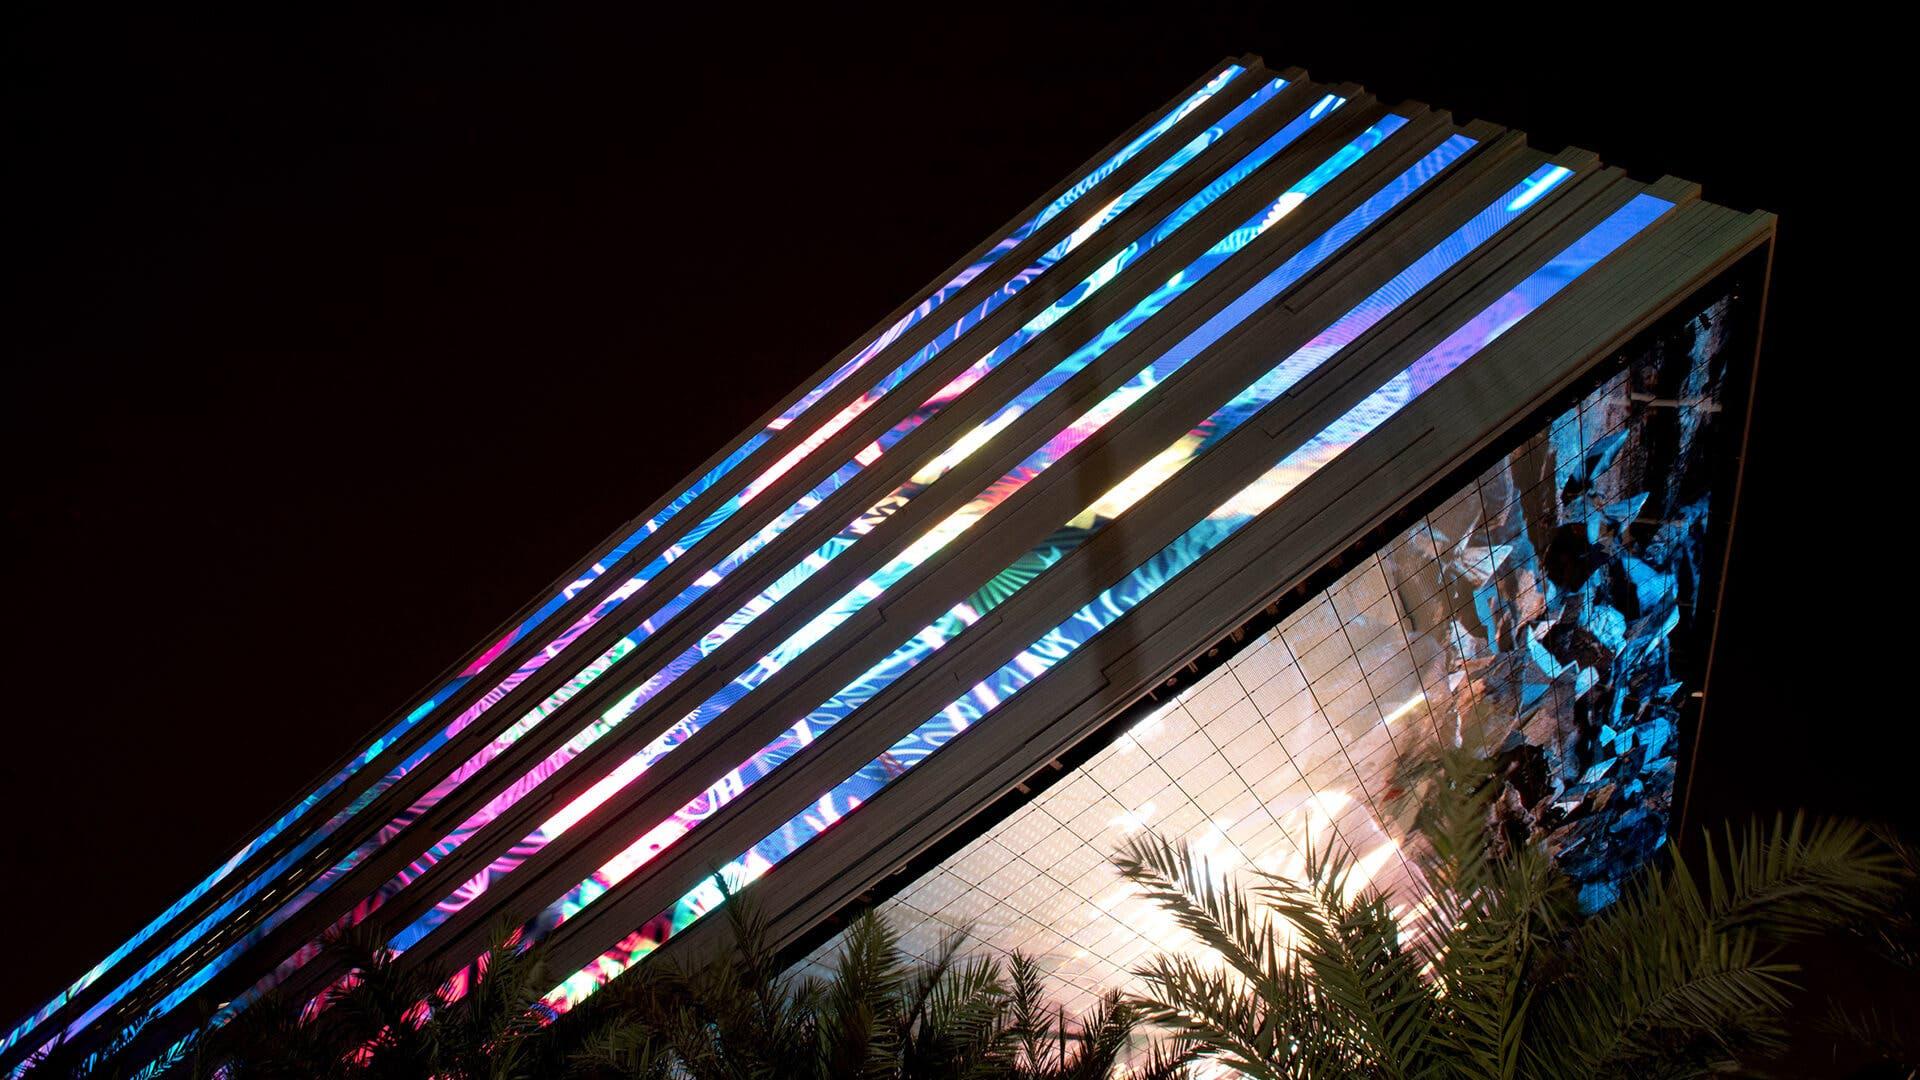 Saudi pavilion at Expo 2020 Dubai. (Expo)